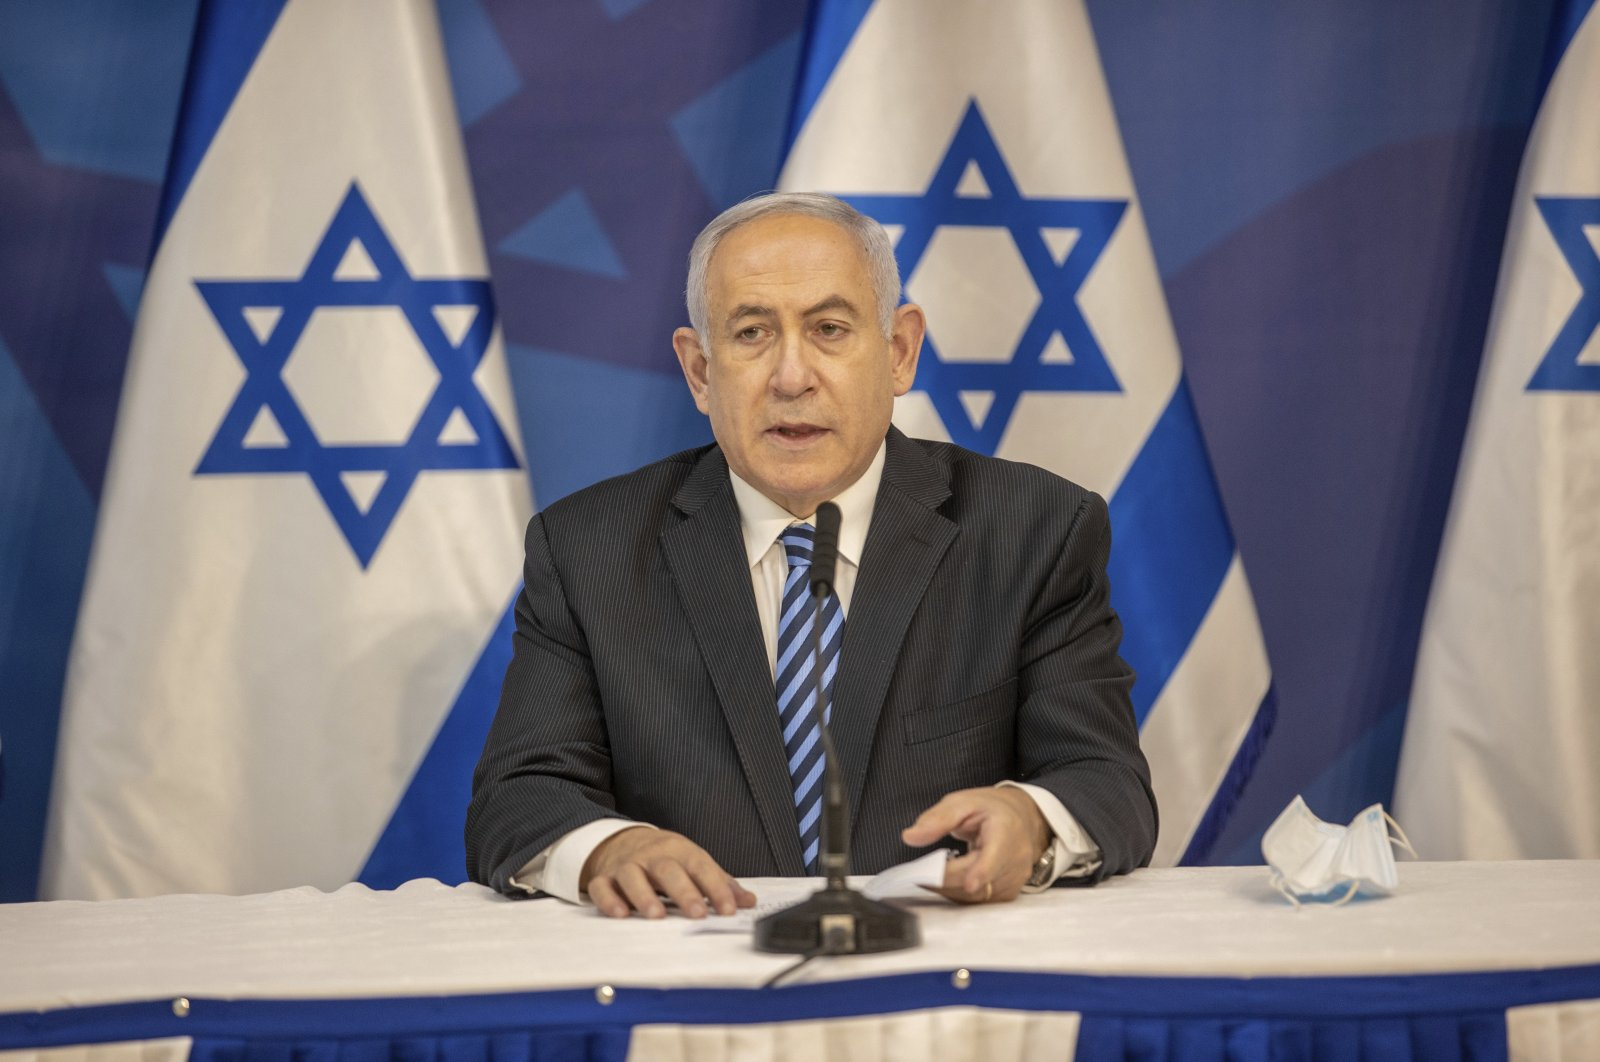 Israeli Prime Minister Benjamin Netanyahu issues a statement at the Israeli Defense Ministry in Tel Aviv, Israel, Monday, July 27, 2020. (AP Photo)